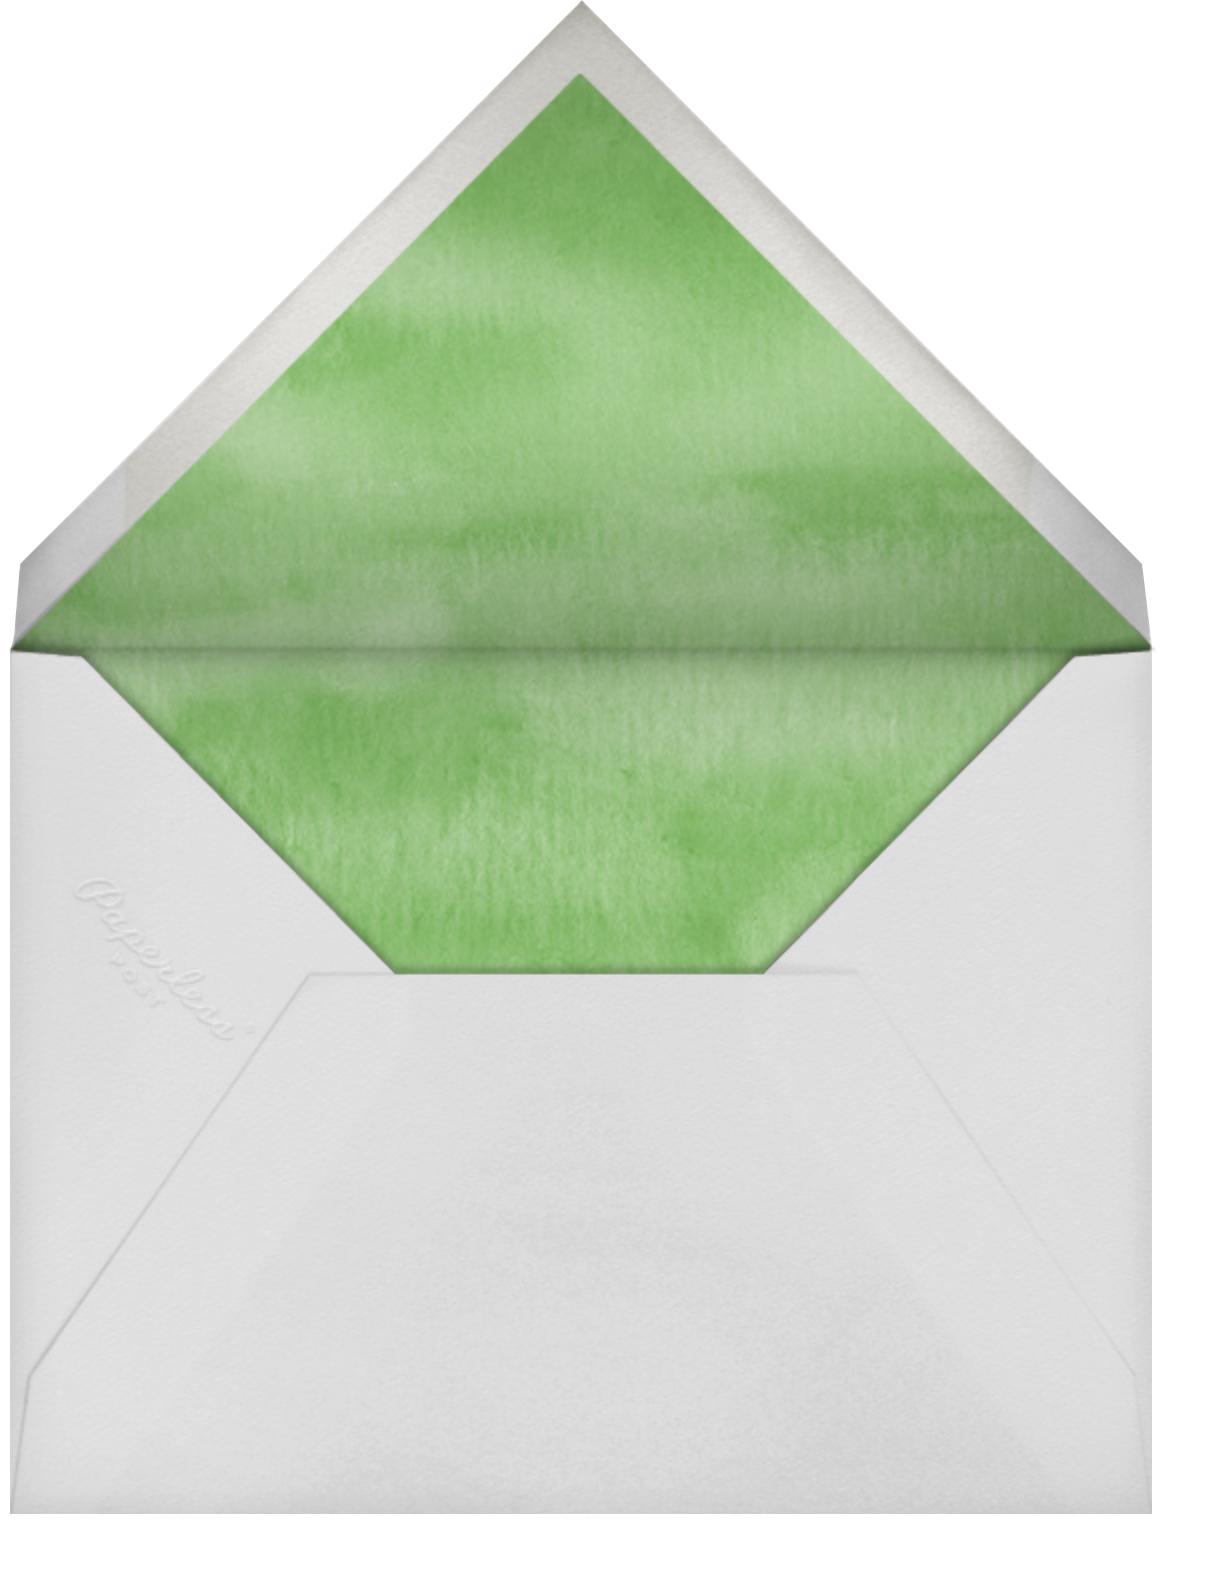 Naiad - Felix Doolittle - Virtual parties - envelope back